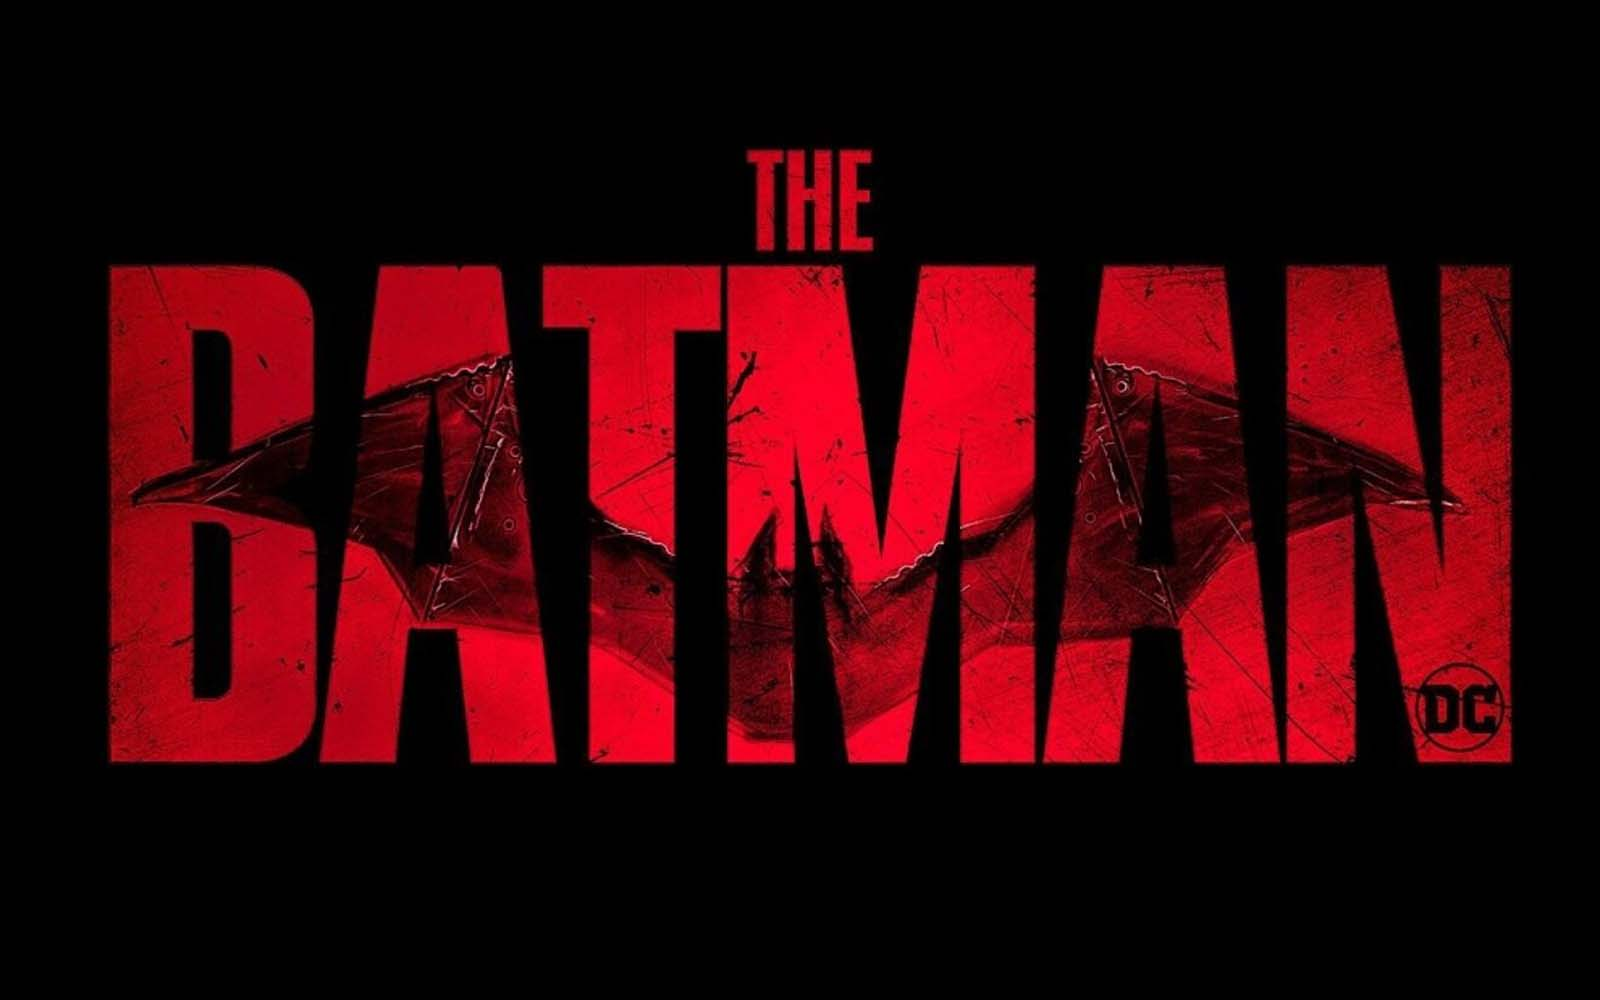 The Batman movie logo